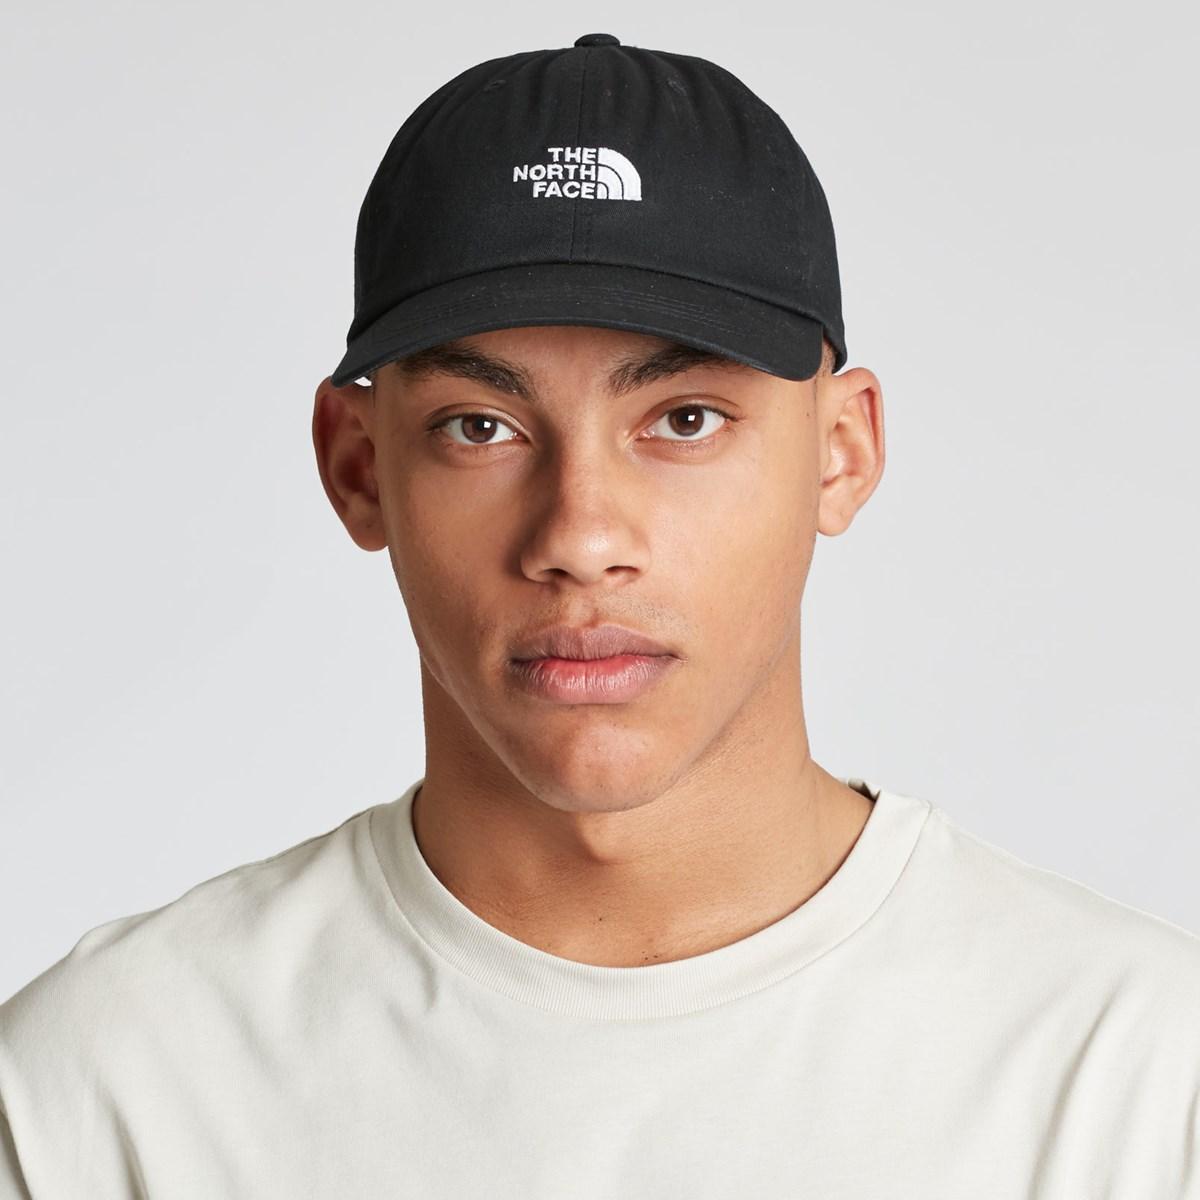 the north face norm hat t9355wky4 sneakers   streetwear på nätet sen 1999.  SNEAKERSNSTUFF 14ba16d0d99a